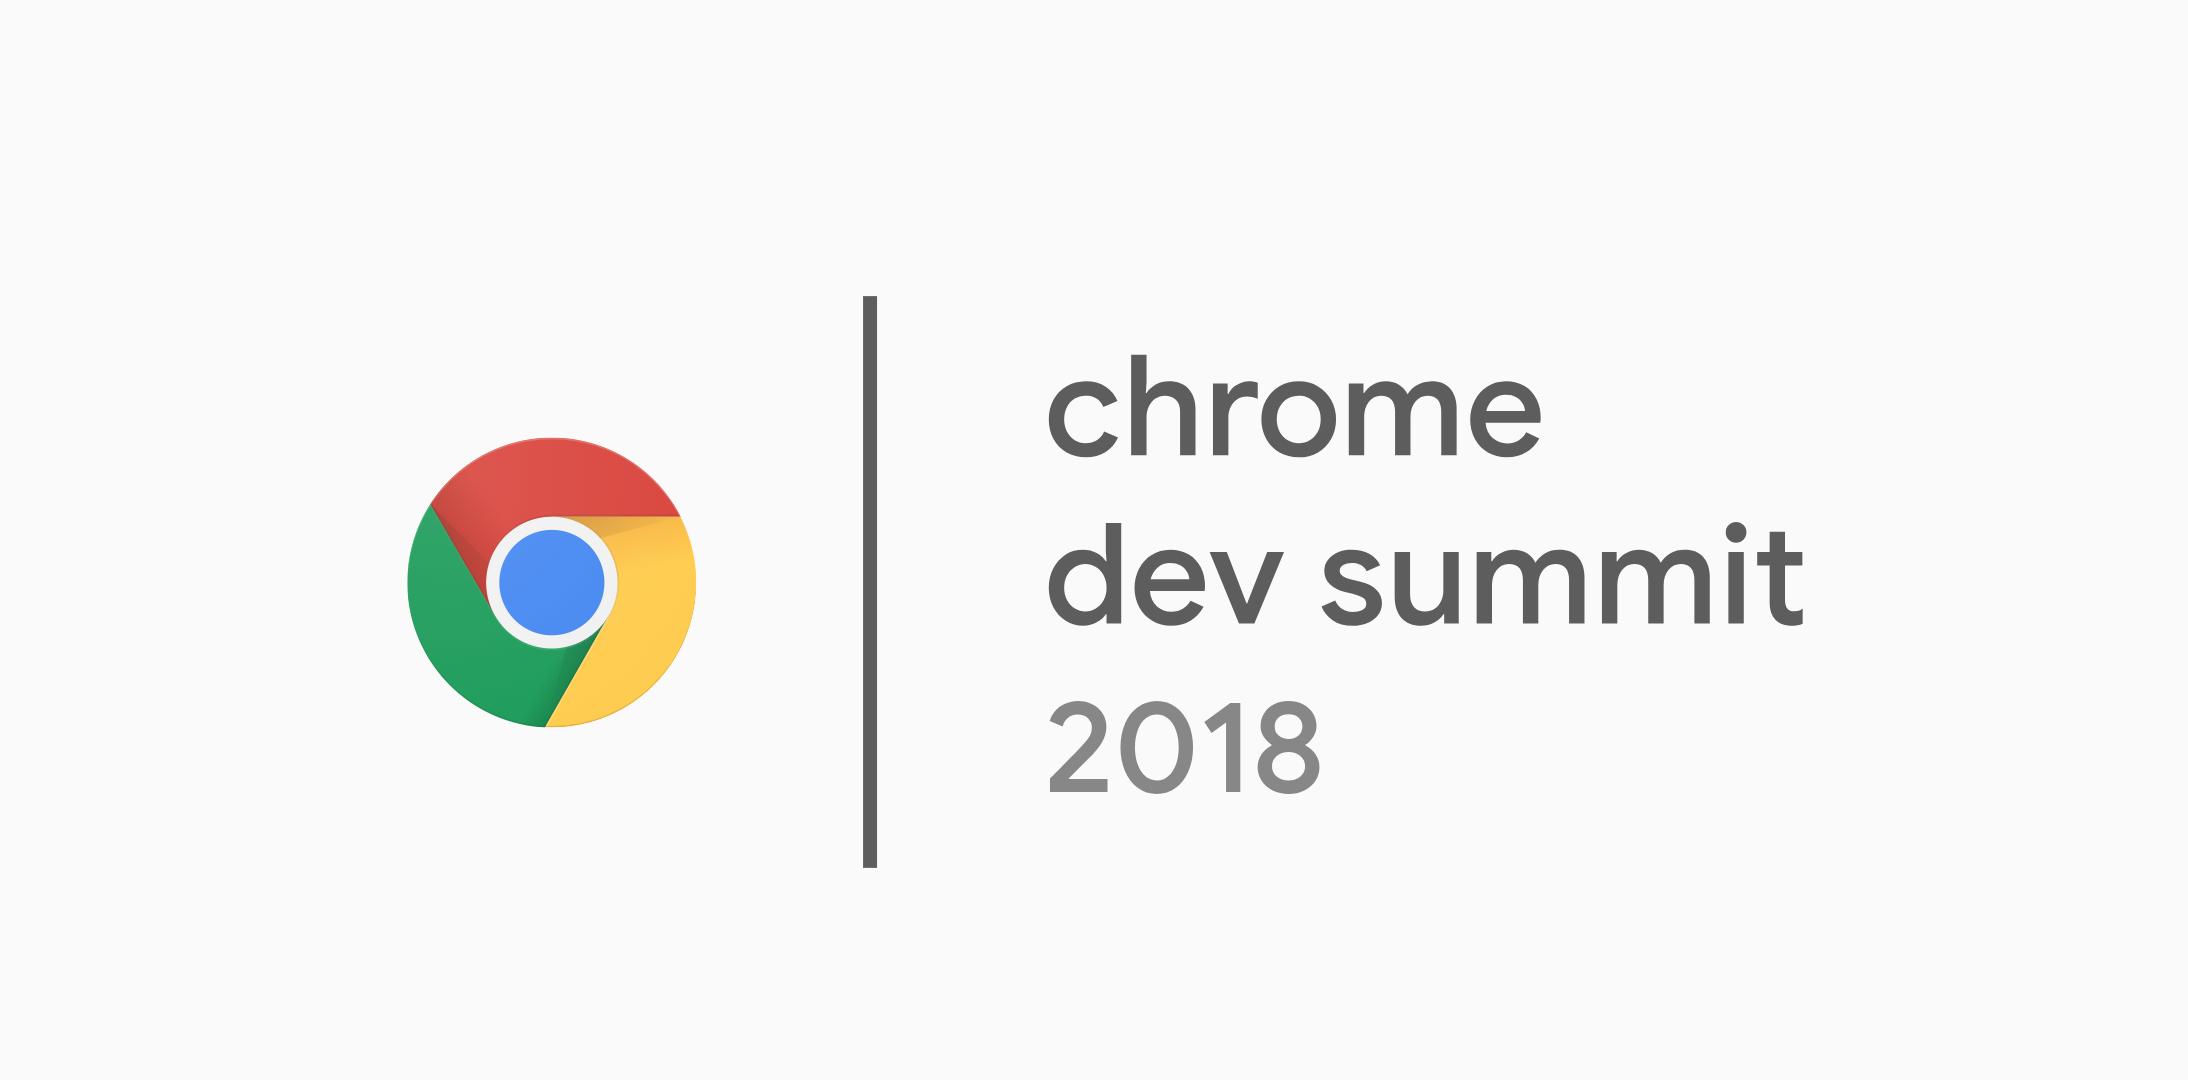 Chrome Dev Summit 2018